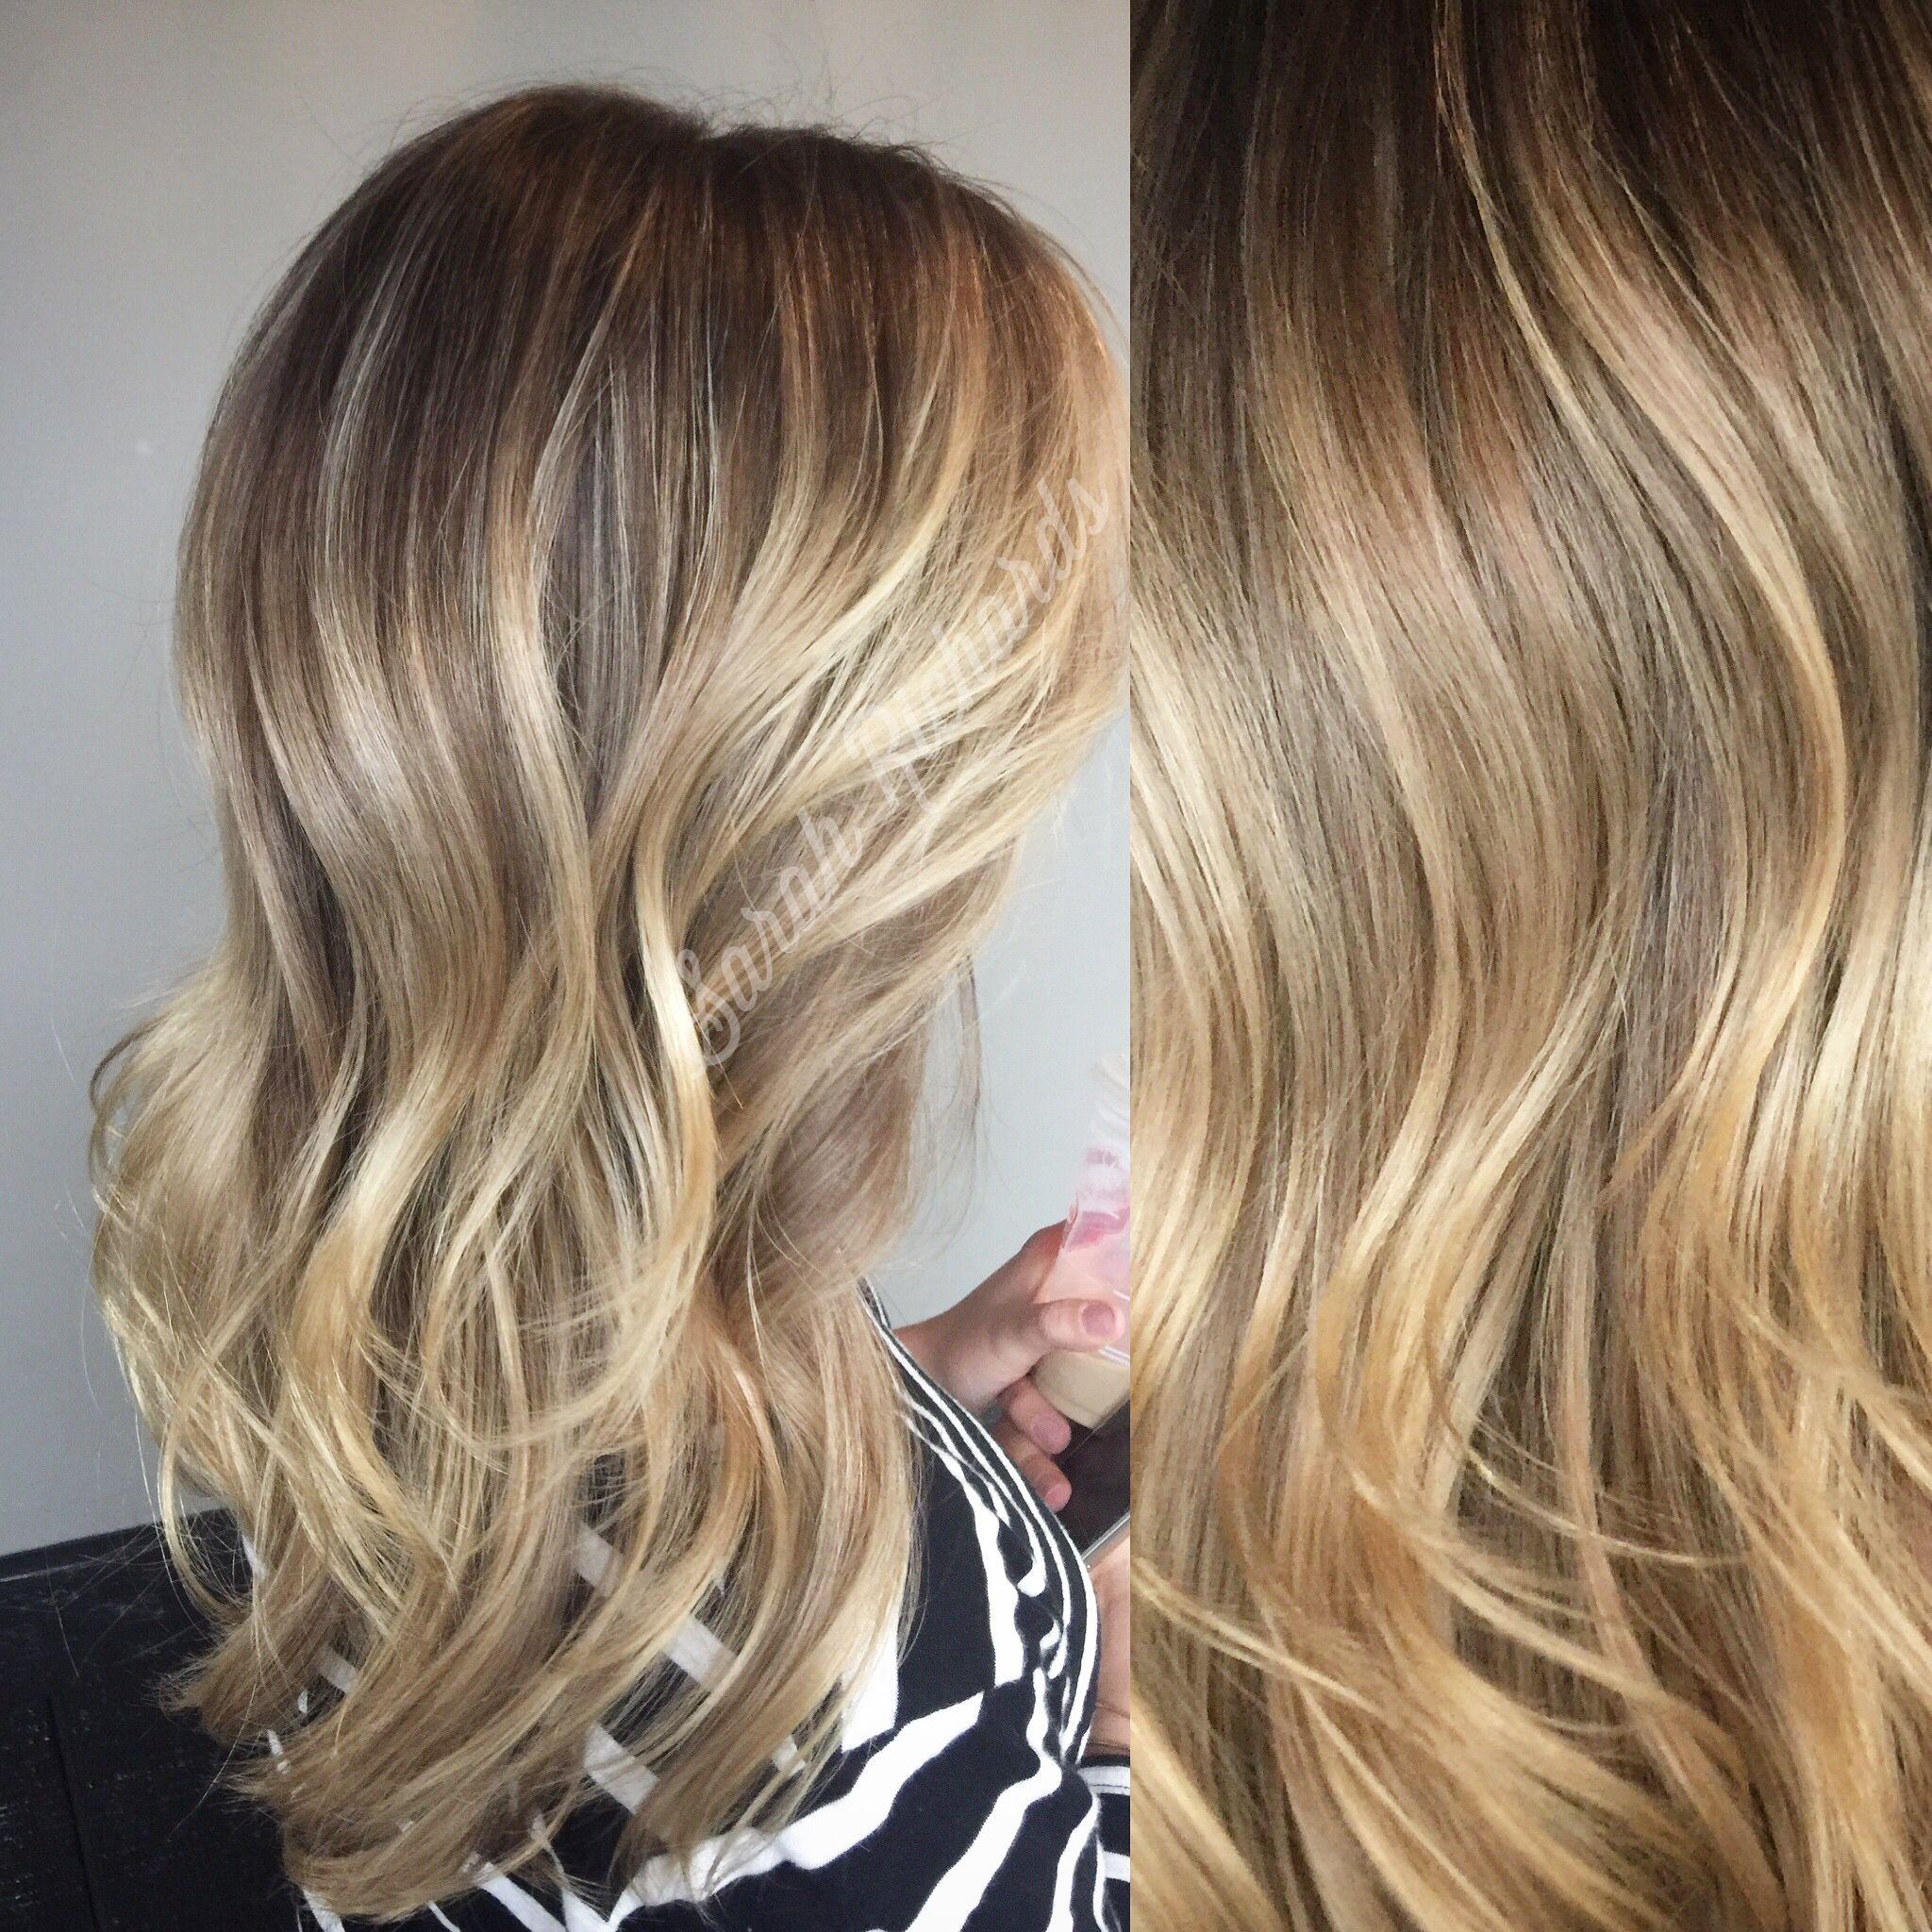 Winter Blonde Shades Eq Redken Color By Sarah Richards